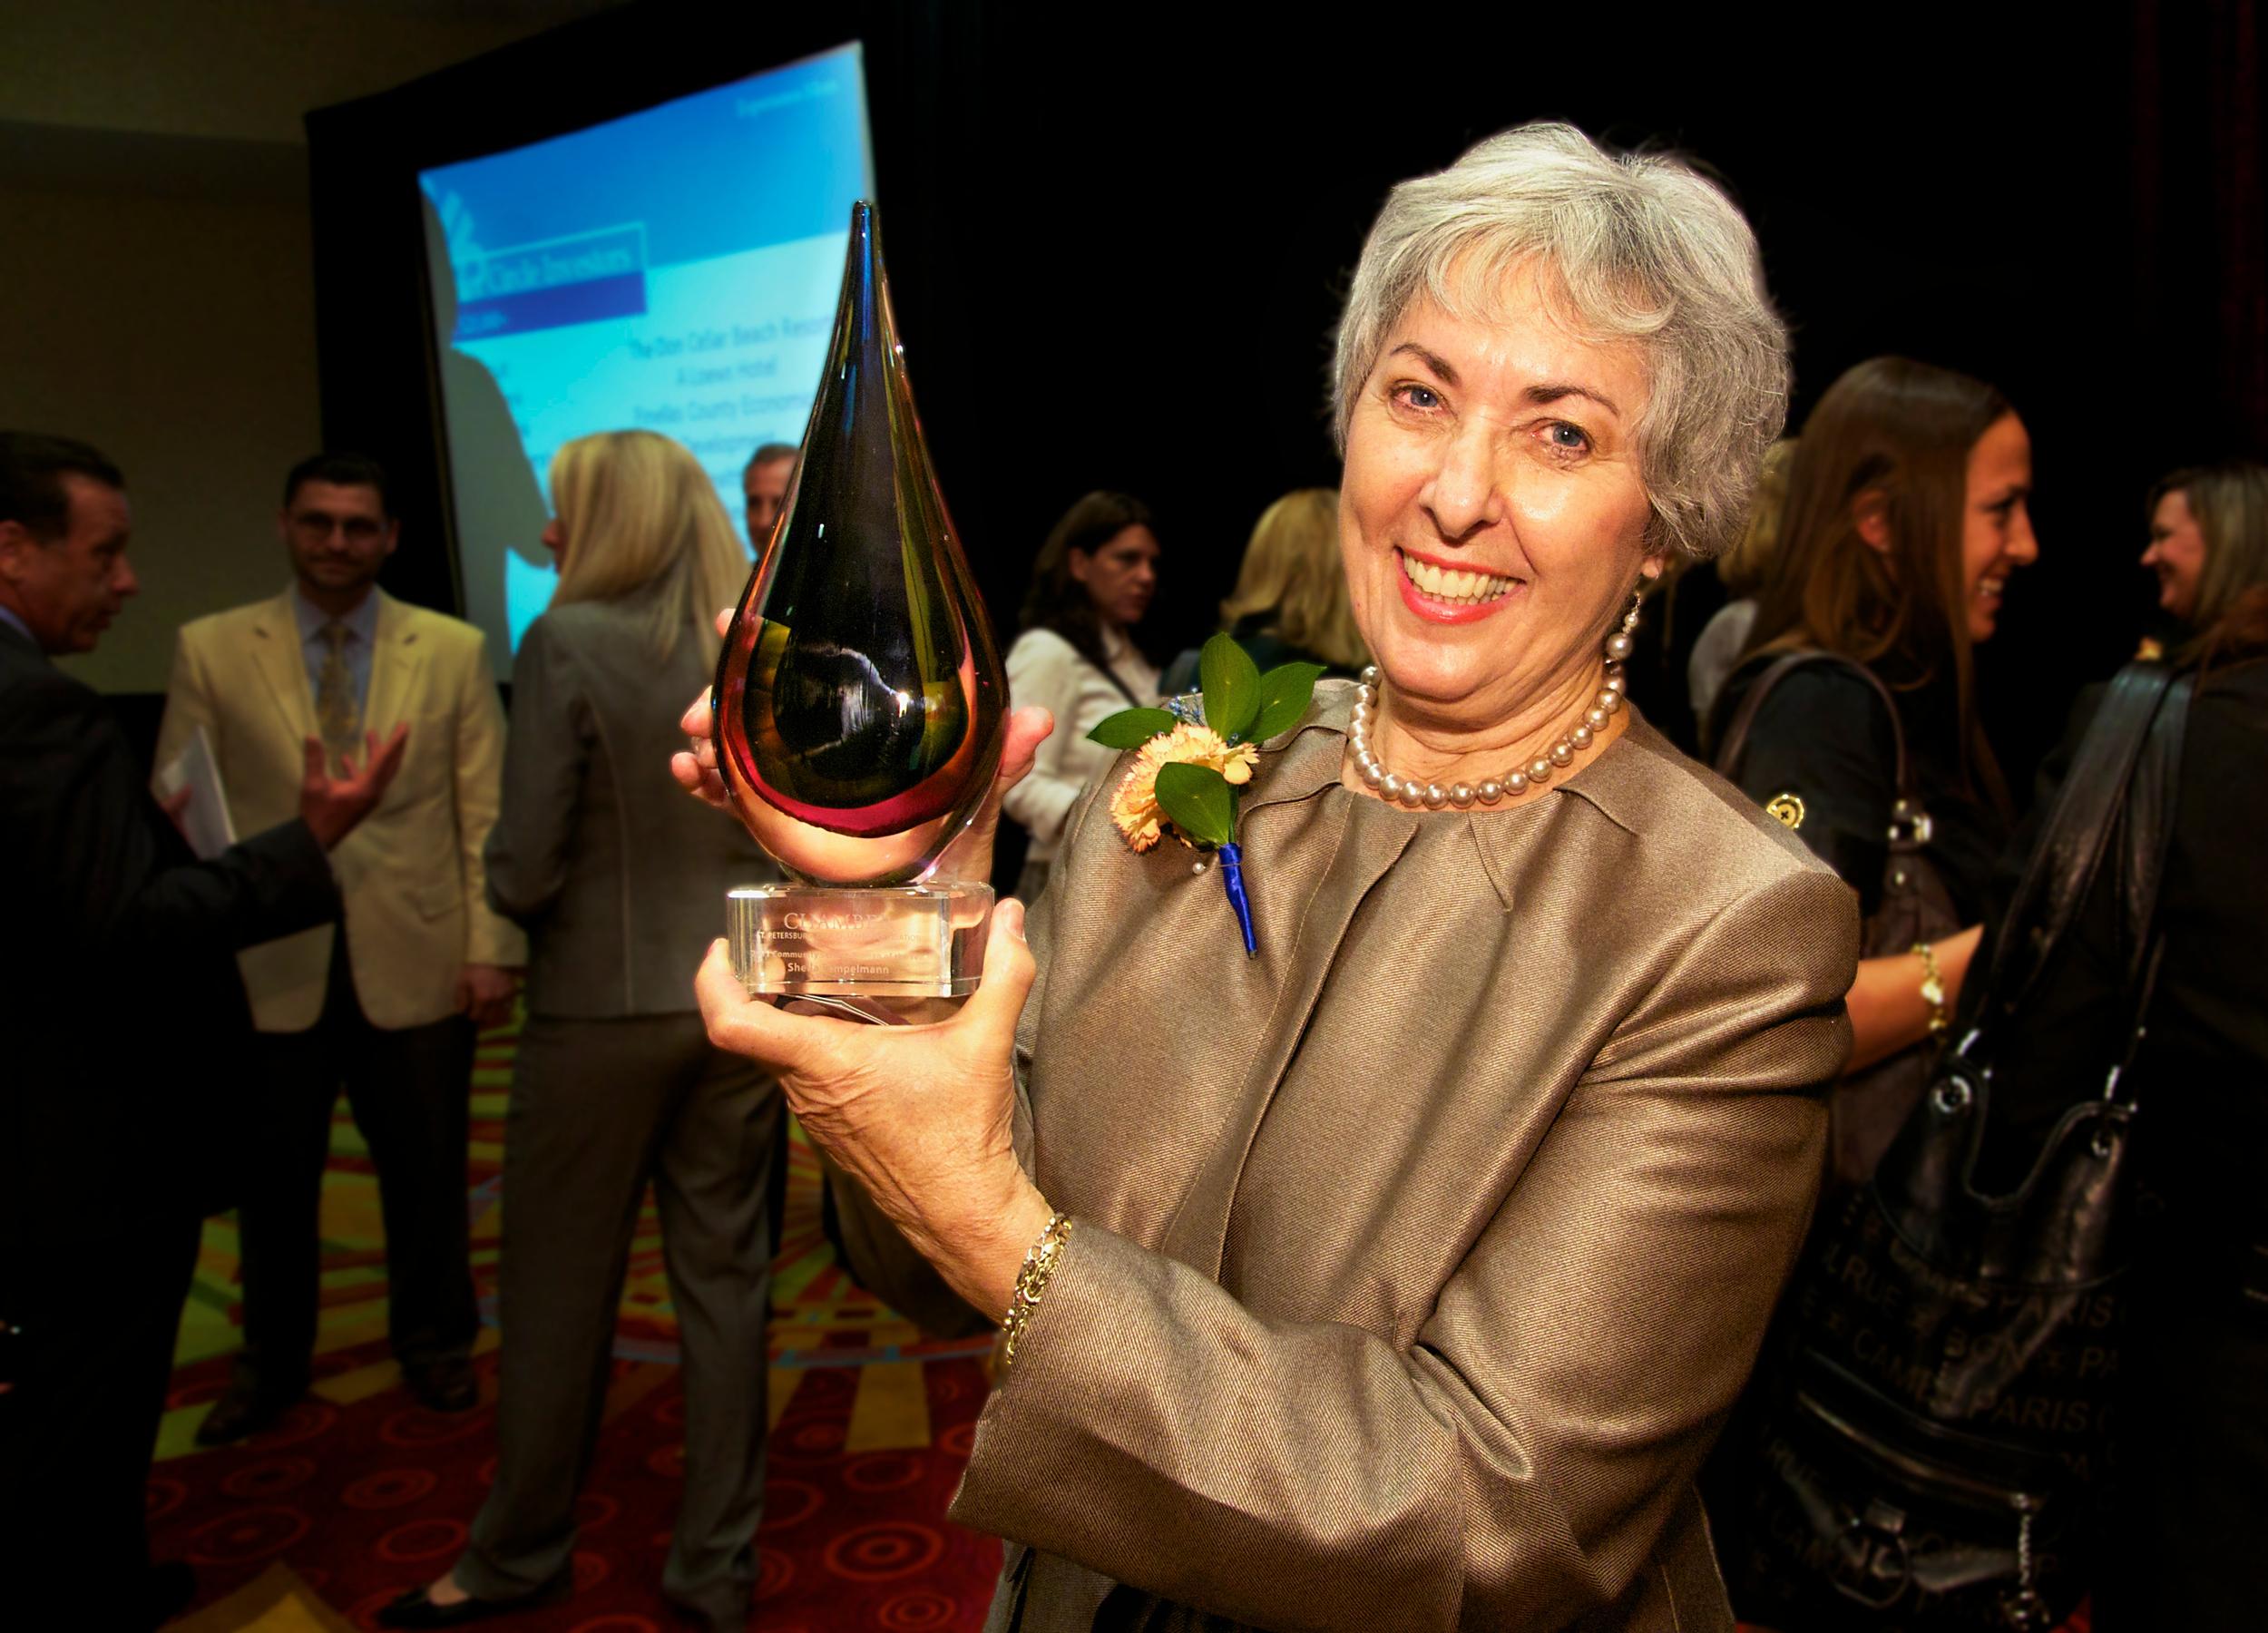 women-awards-ceremony-florida-event.jpg